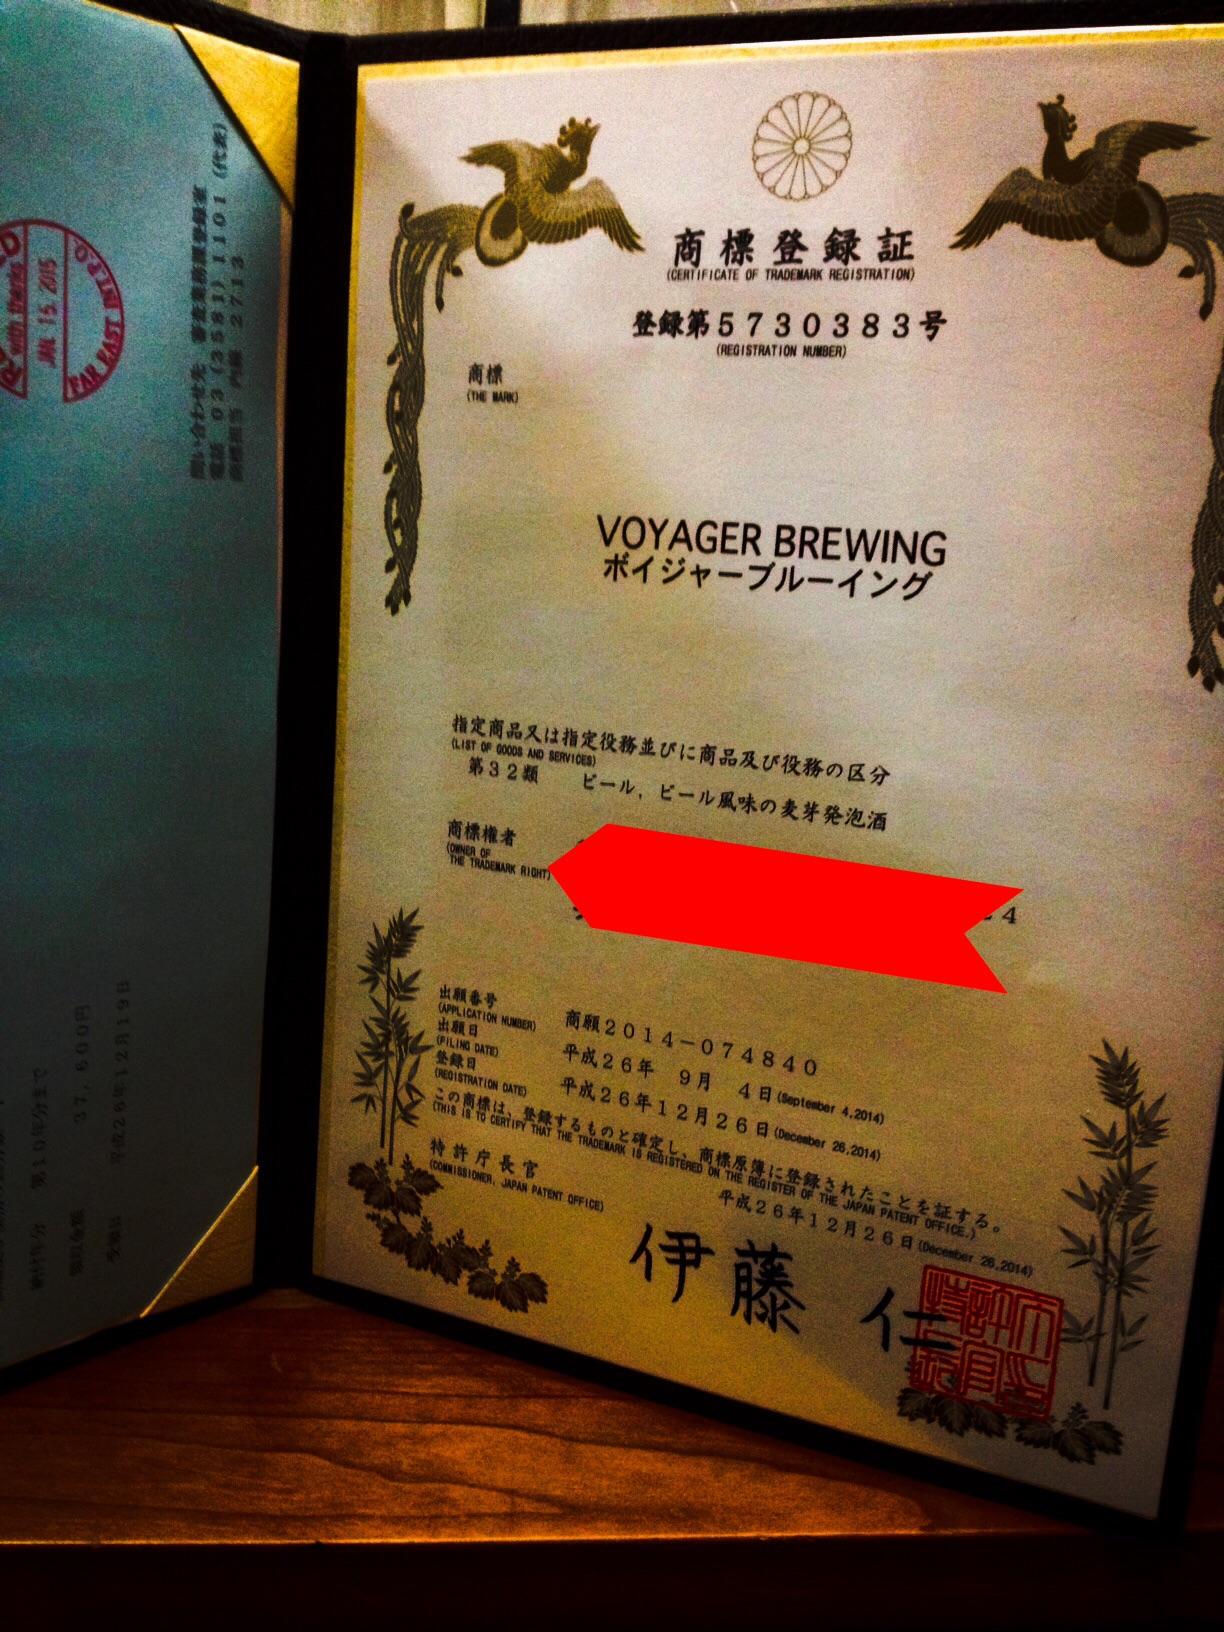 VOYAGER BREWING/ボイジャーブルーイング商標登録証(CRAFT BEER BRAND)